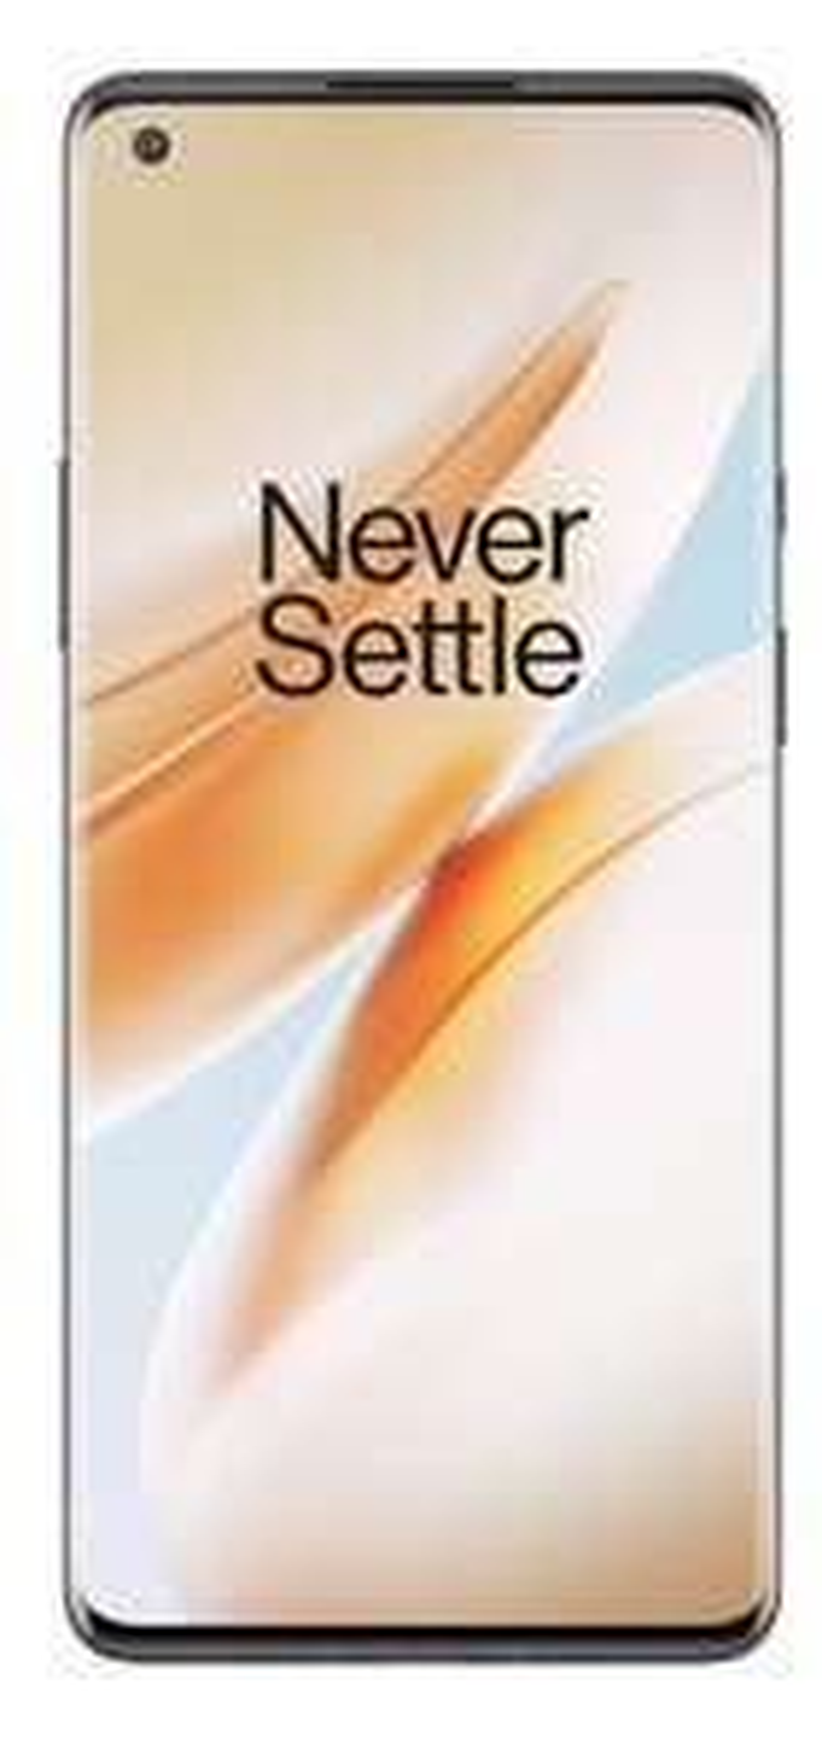 "Smartphone 6.78"" OnePlus 8 Pro 5G - 8Go RAM, 128Go ROM (820€ avec le code RAKUTEN30 +42.50€ en SuperPoints)"